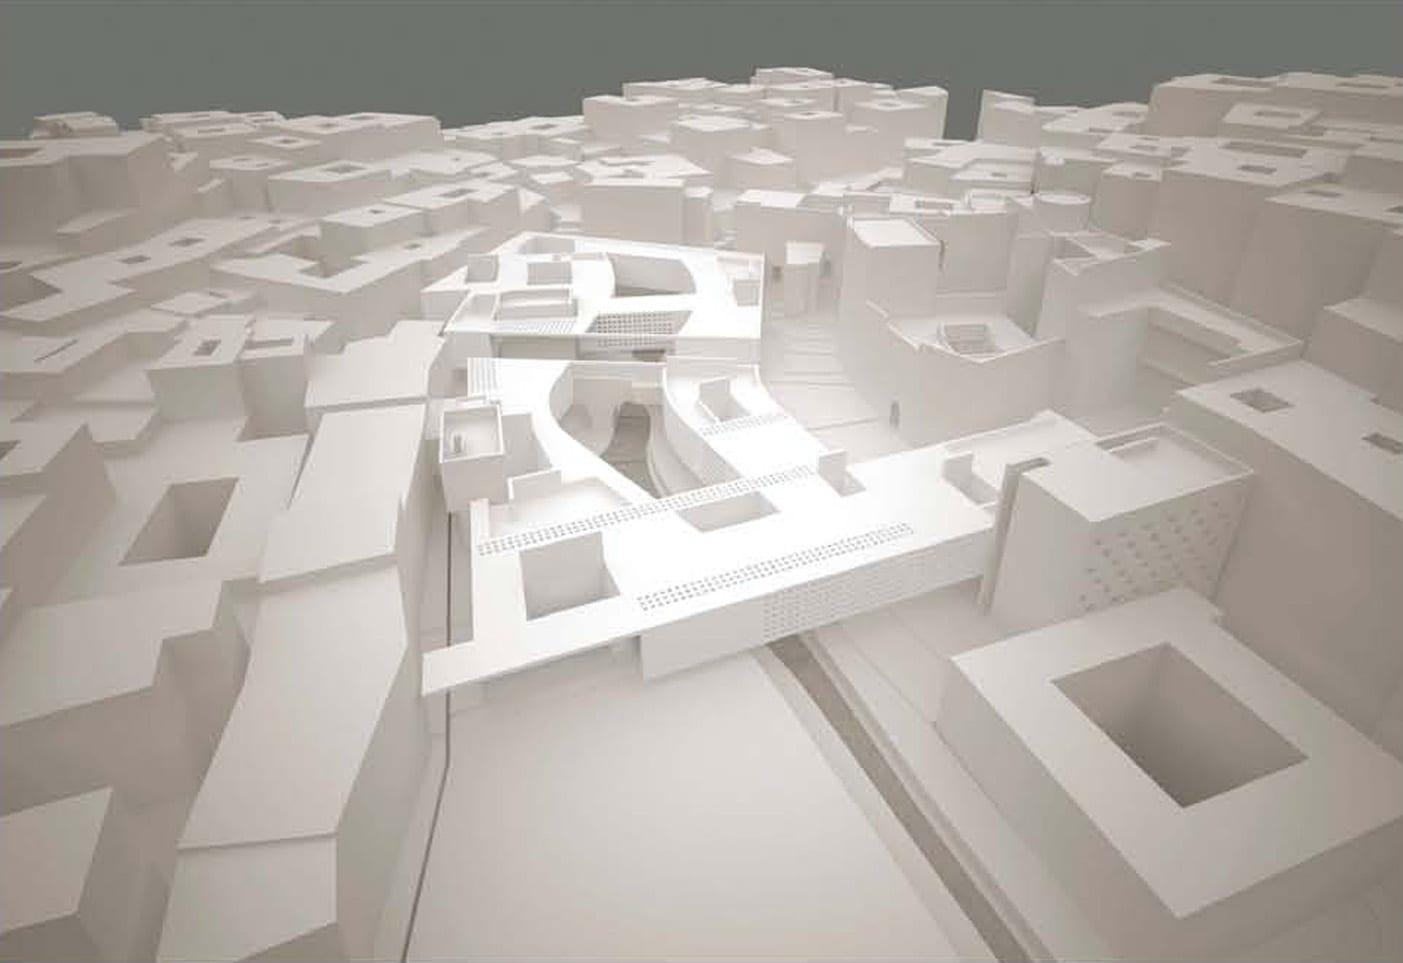 fes_3d_representation_5006_kolb_hader_architekten_kubik_studio